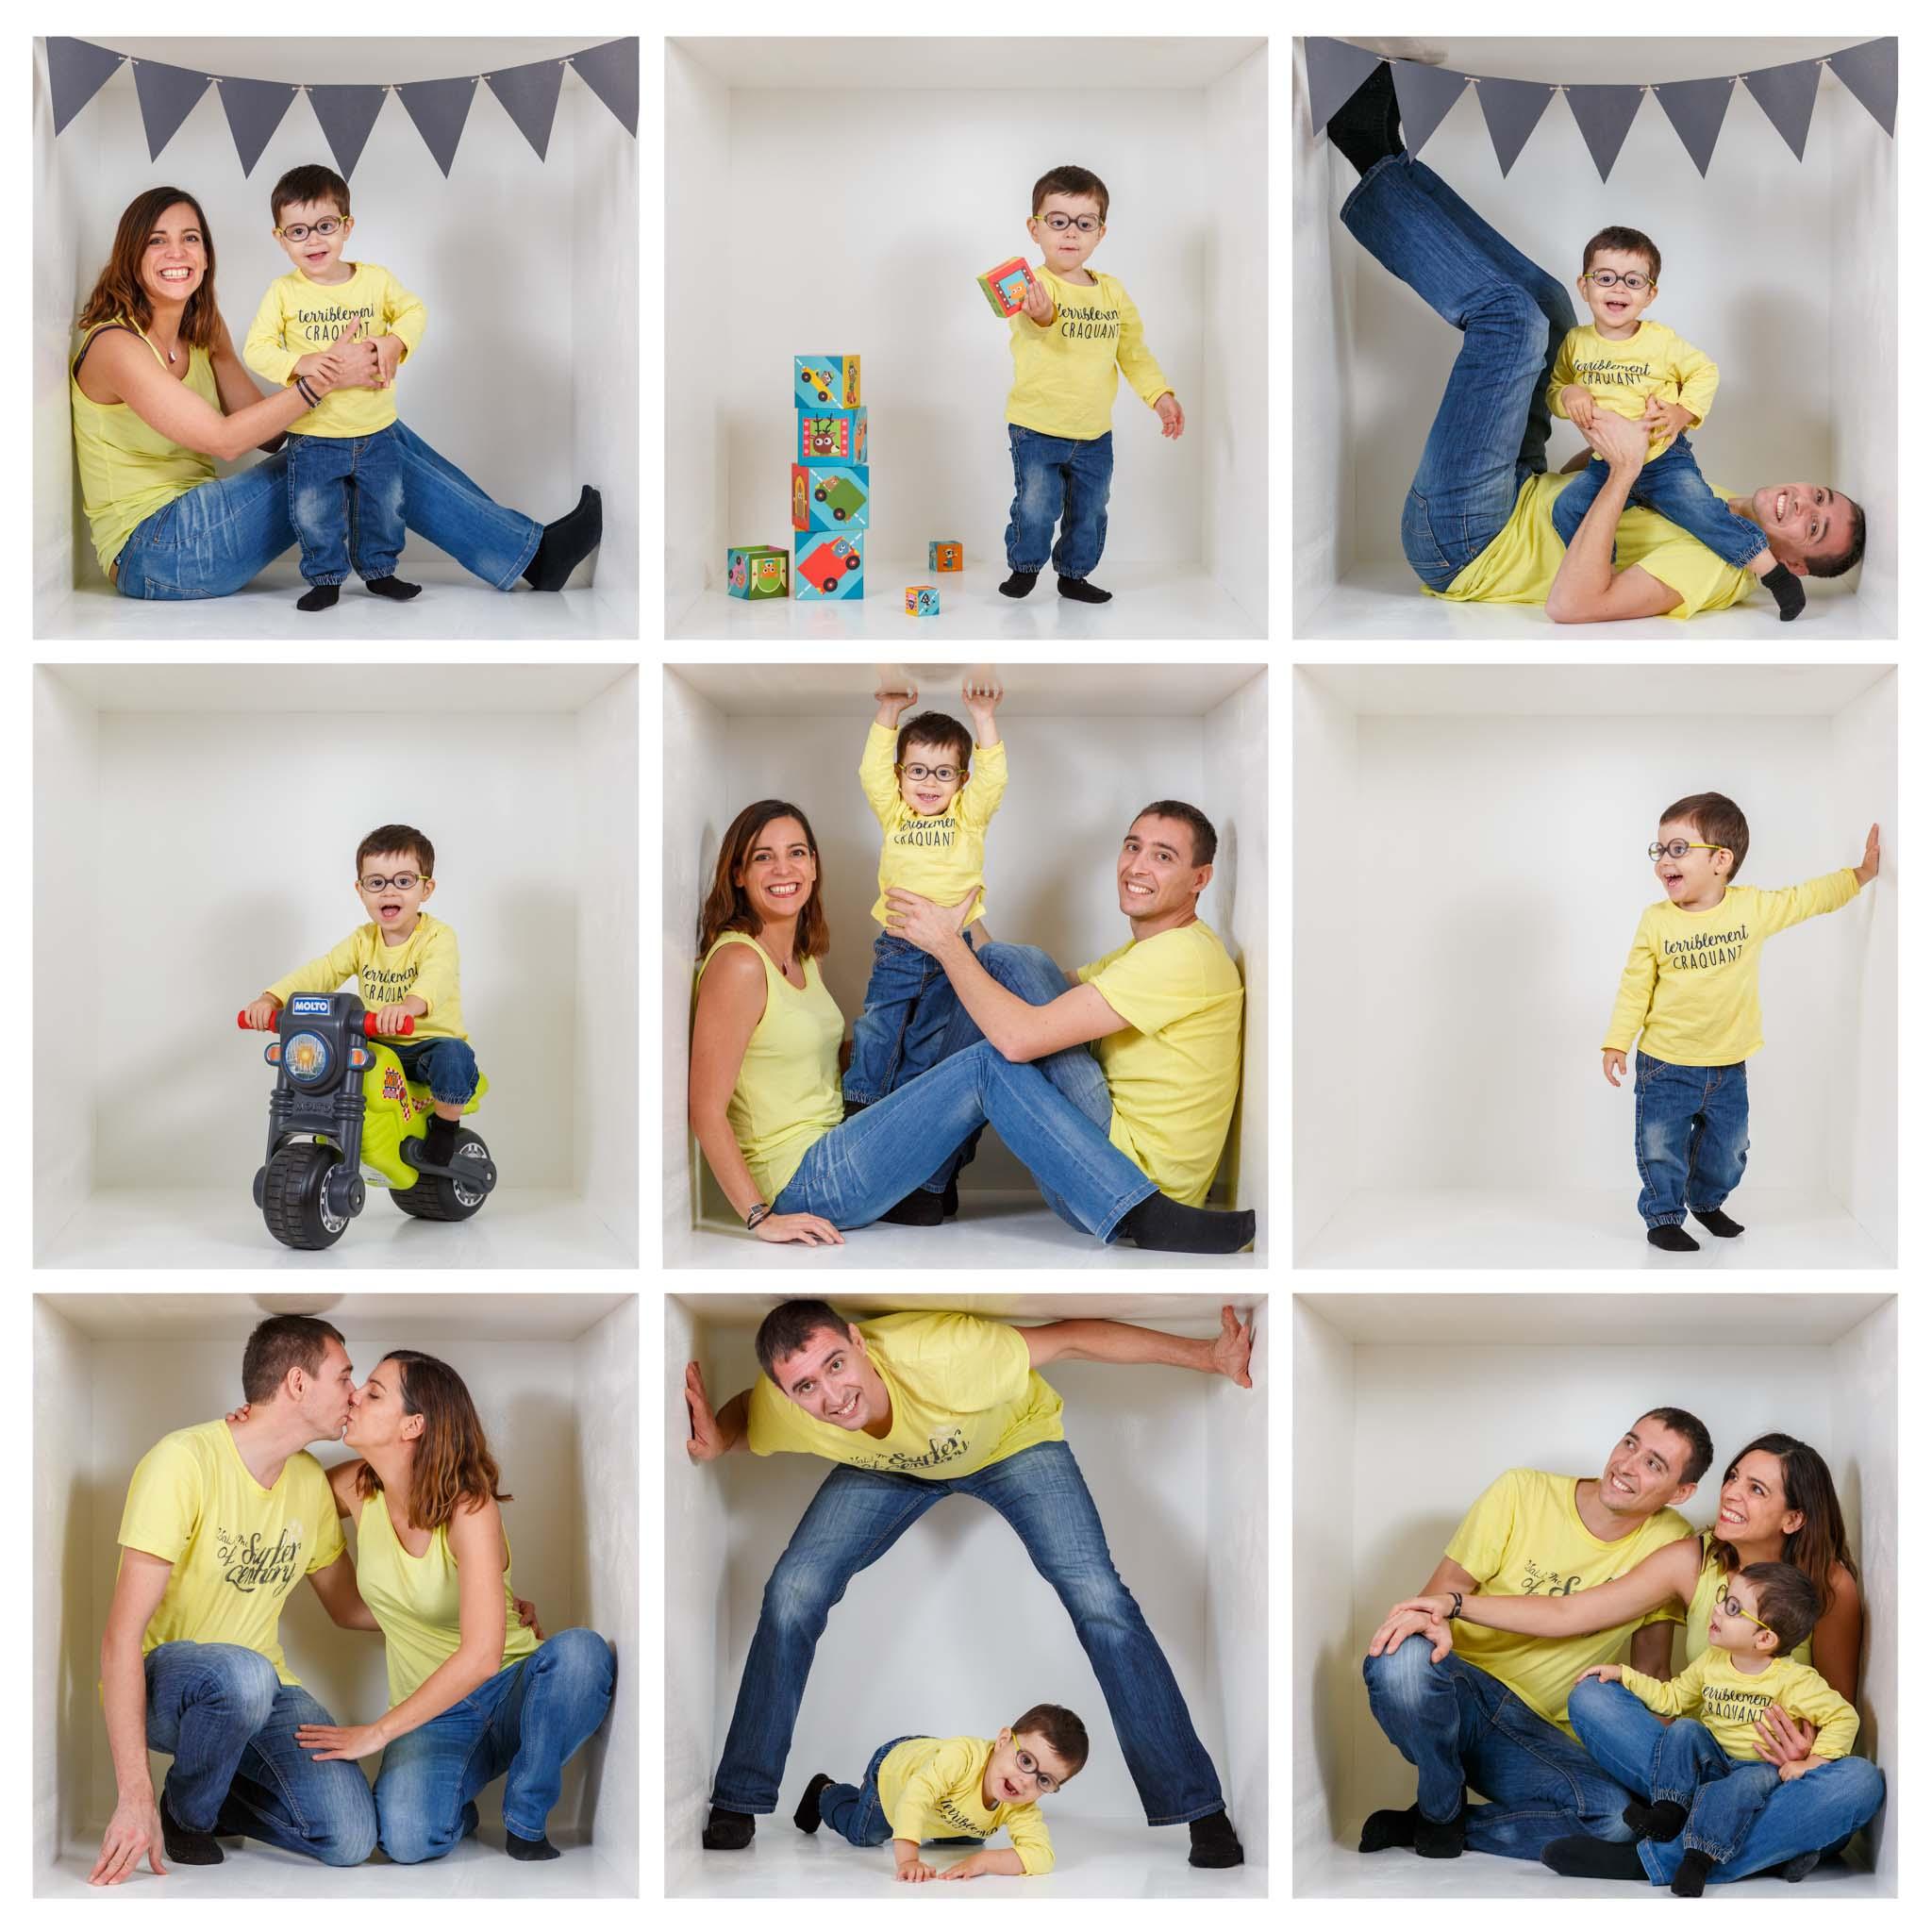 photographe famille boite box toulouse